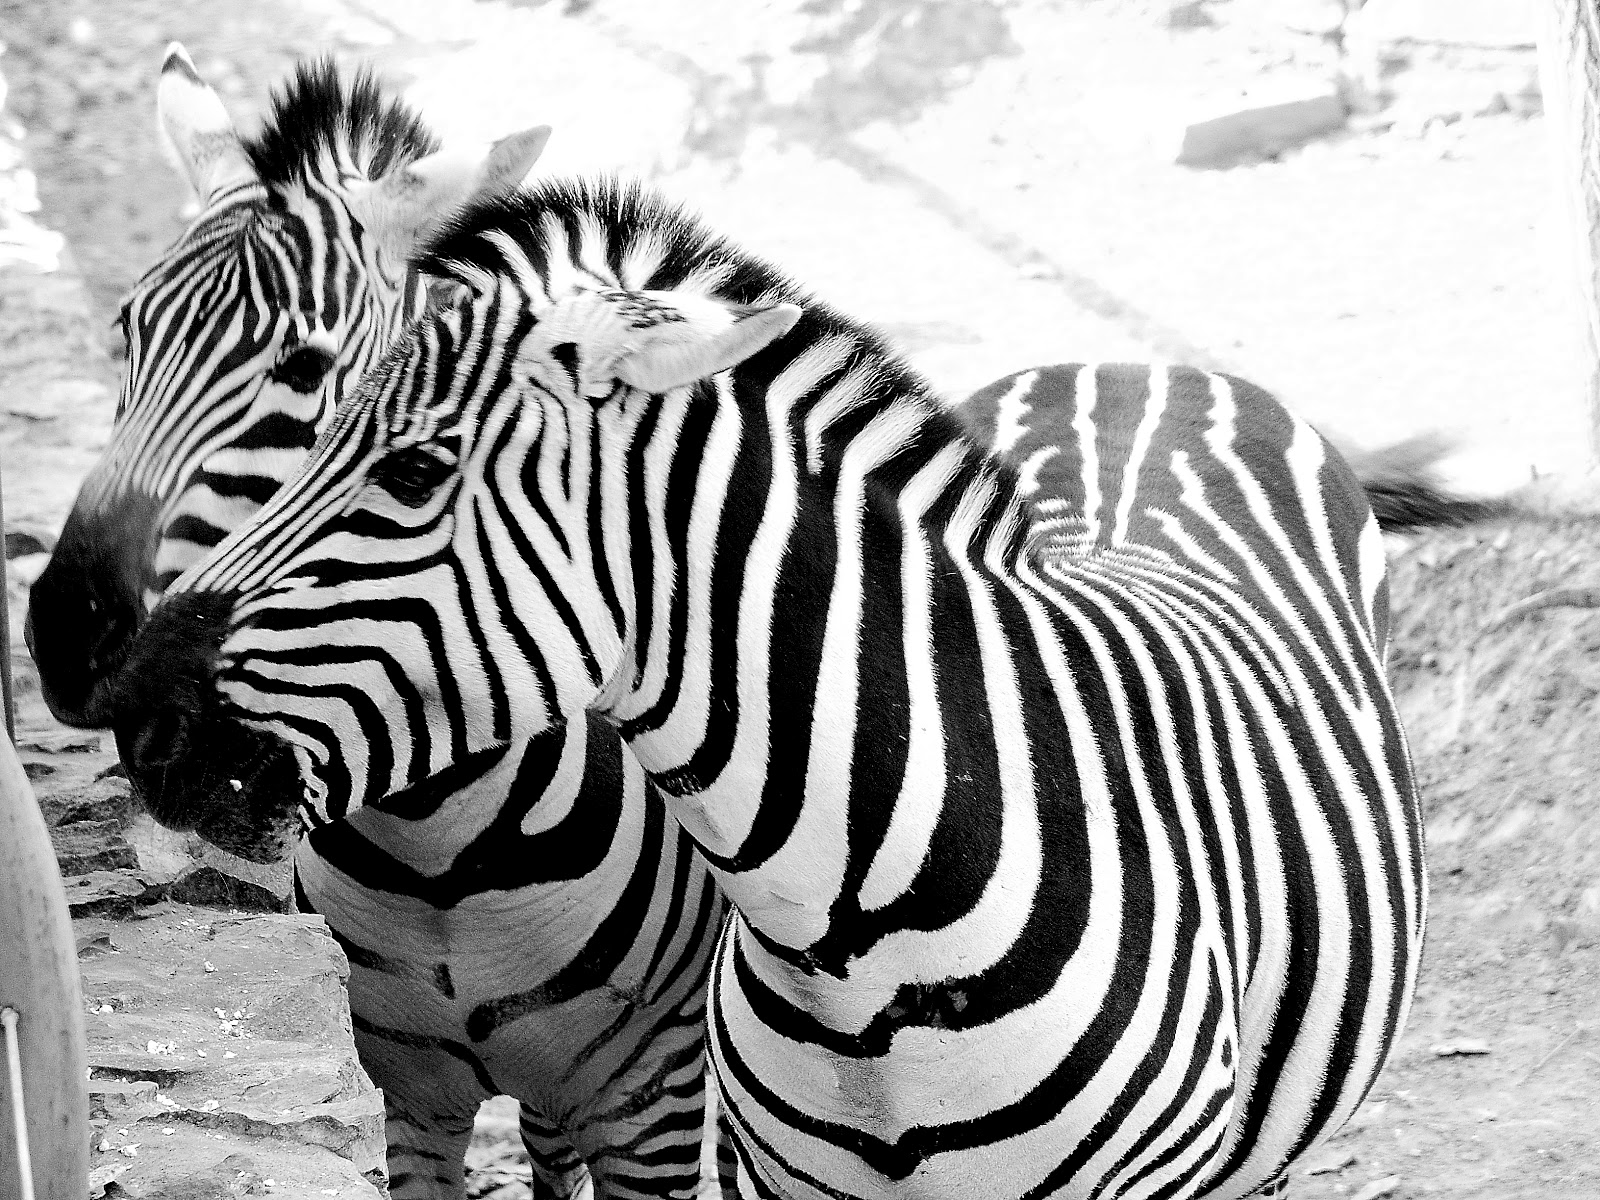 Zebra hd wallpapers high definition free background for Zebra wallpaper